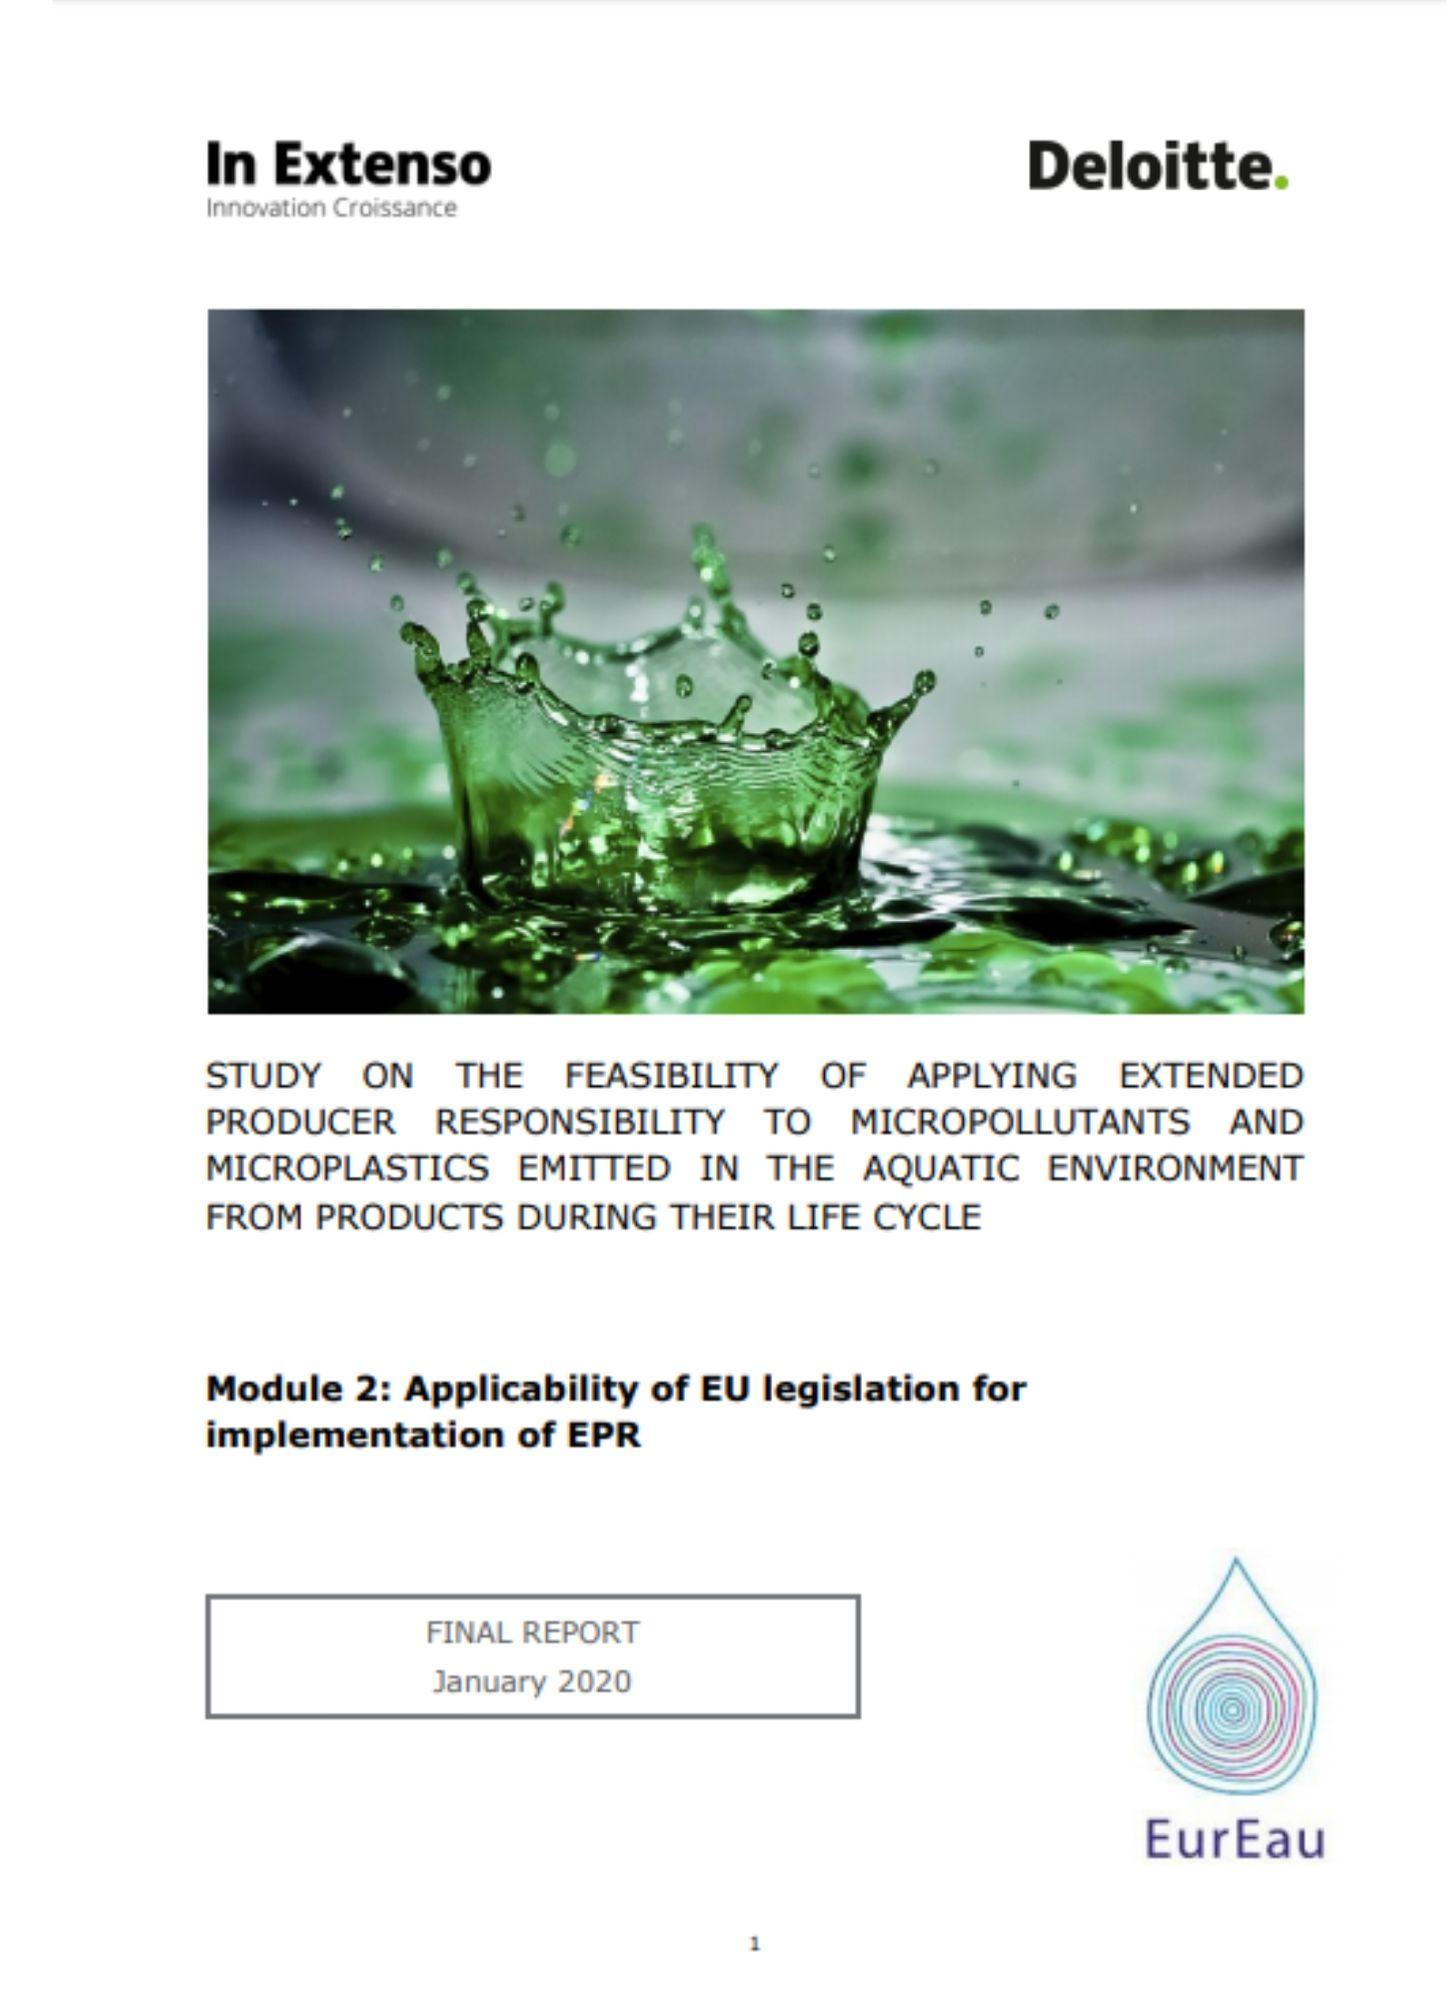 Deloitte EurEau Report - Extended Producer Responsibility - Module 2